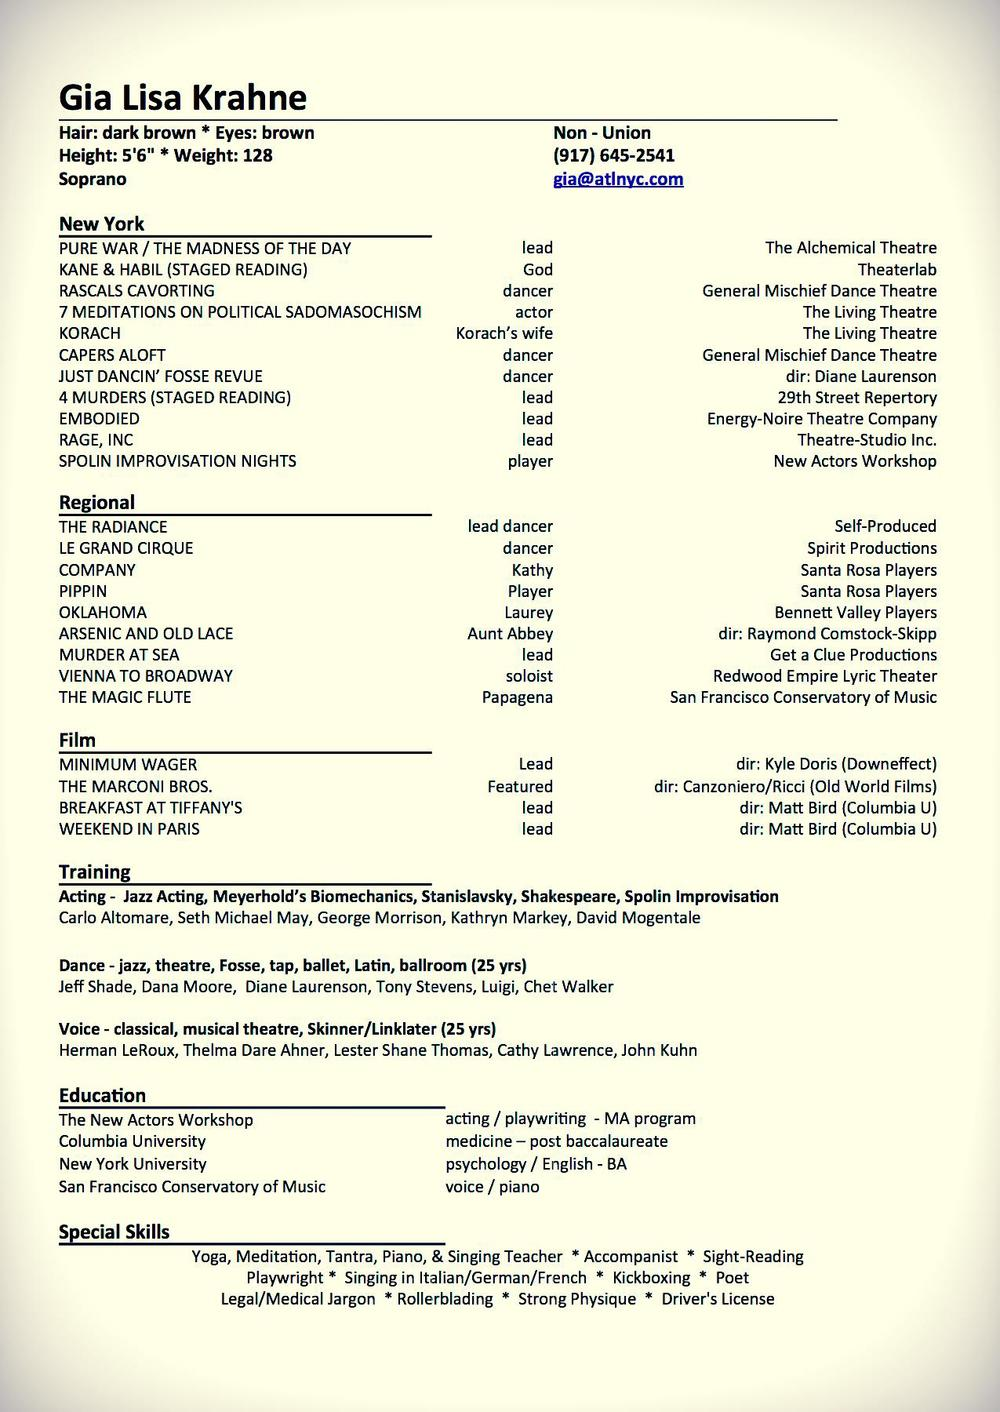 Theatre Resume 2013.jpg